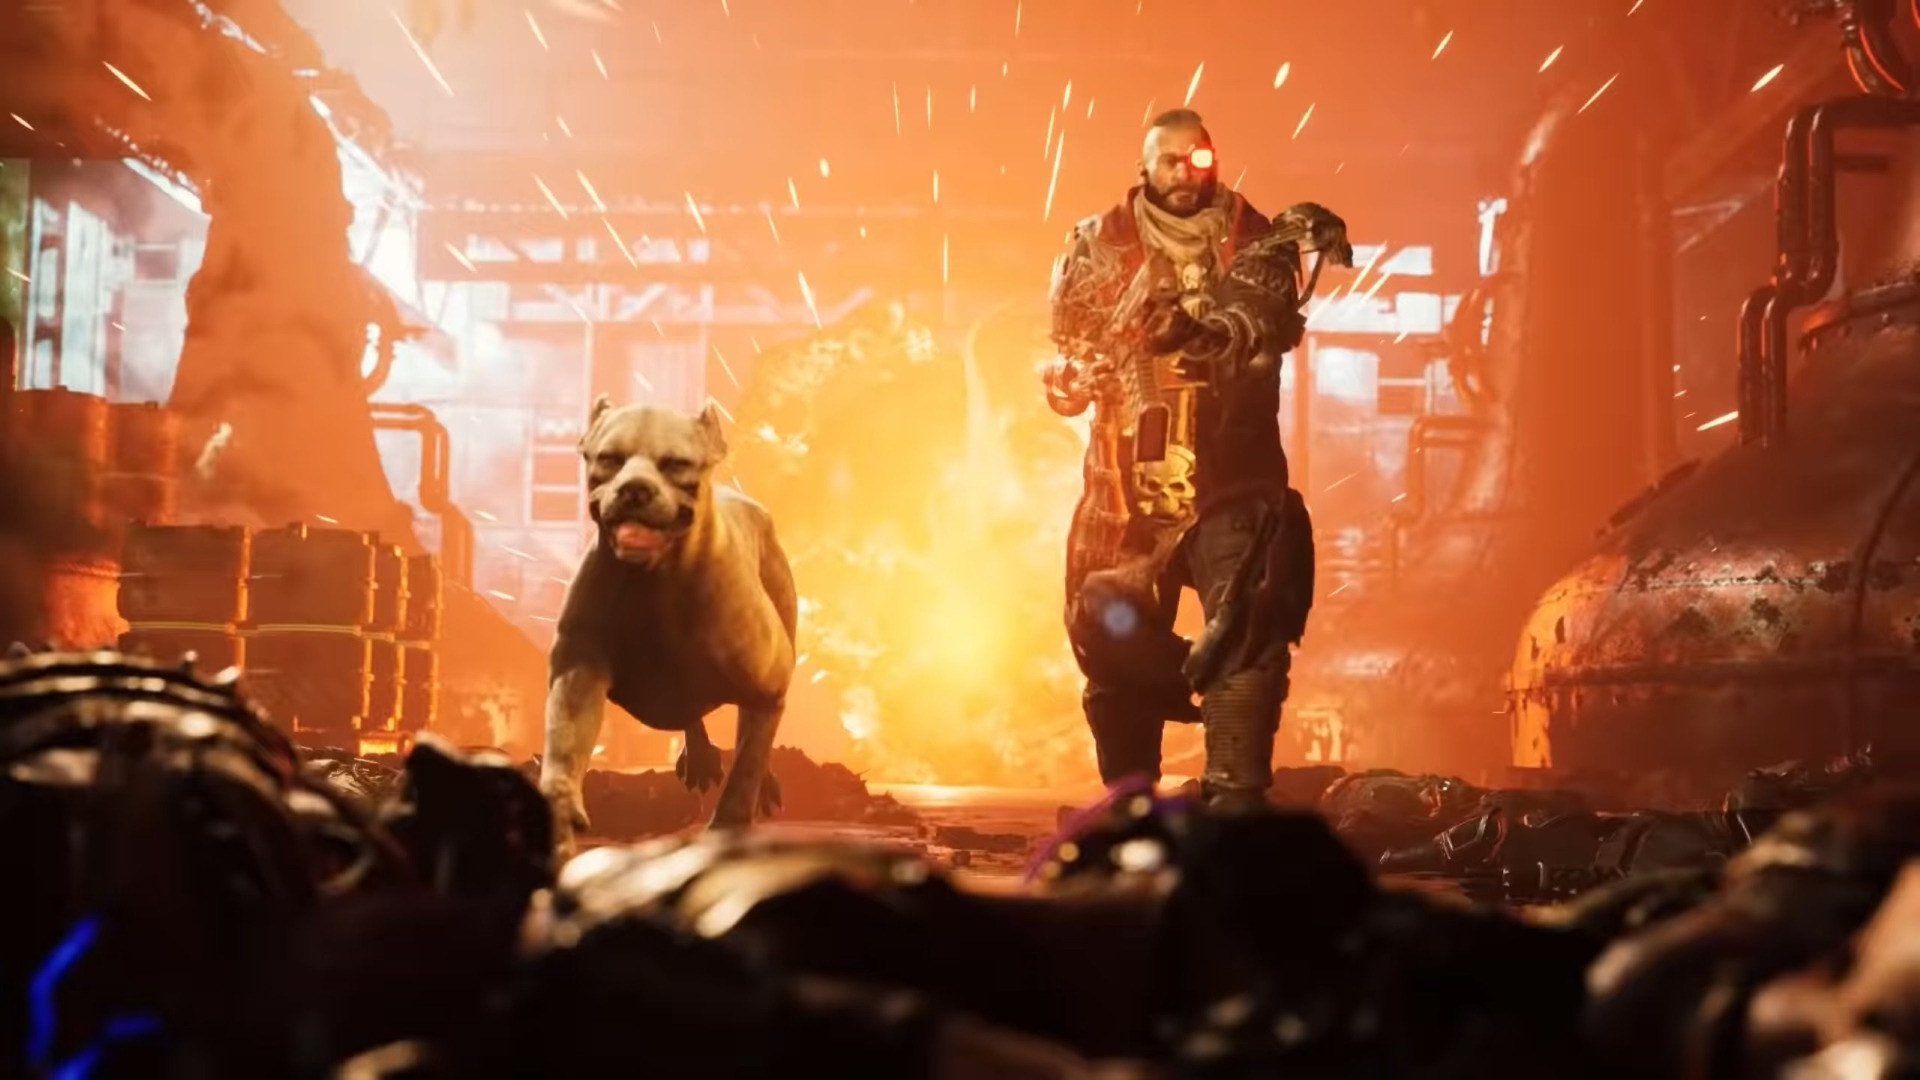 Trailer, Ego-Shooter, Shooter, Focus Home Interactive, Warhammer 40k, Warhammer, Necromunda: Hired Gun, Focus Home, Warhammer 40.000, Necromunda